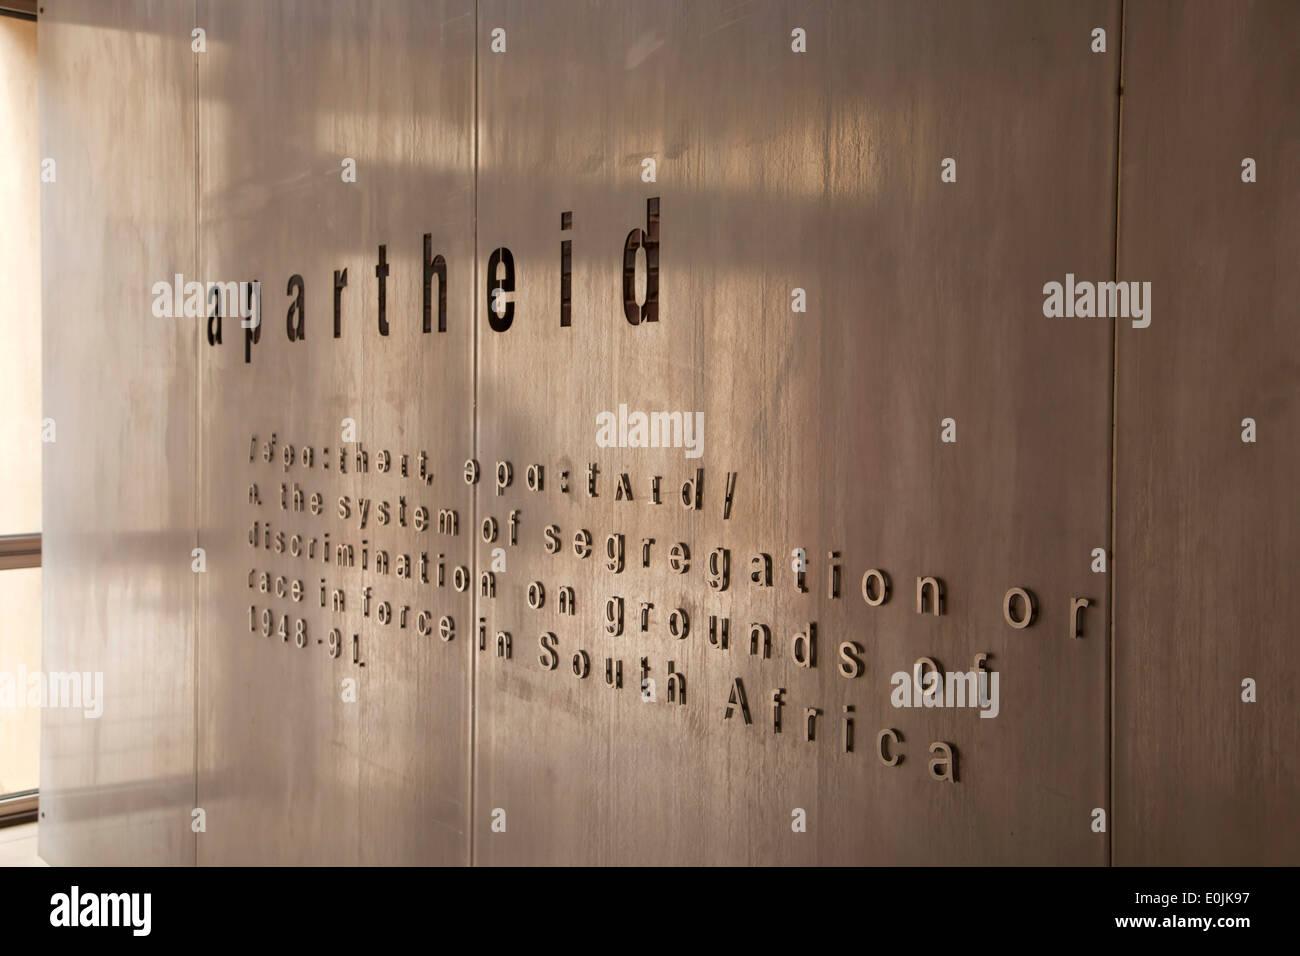 Encyclopedic Apartheid sign, Johannesburg, Gauteng, South Africa, Africa - Stock Image